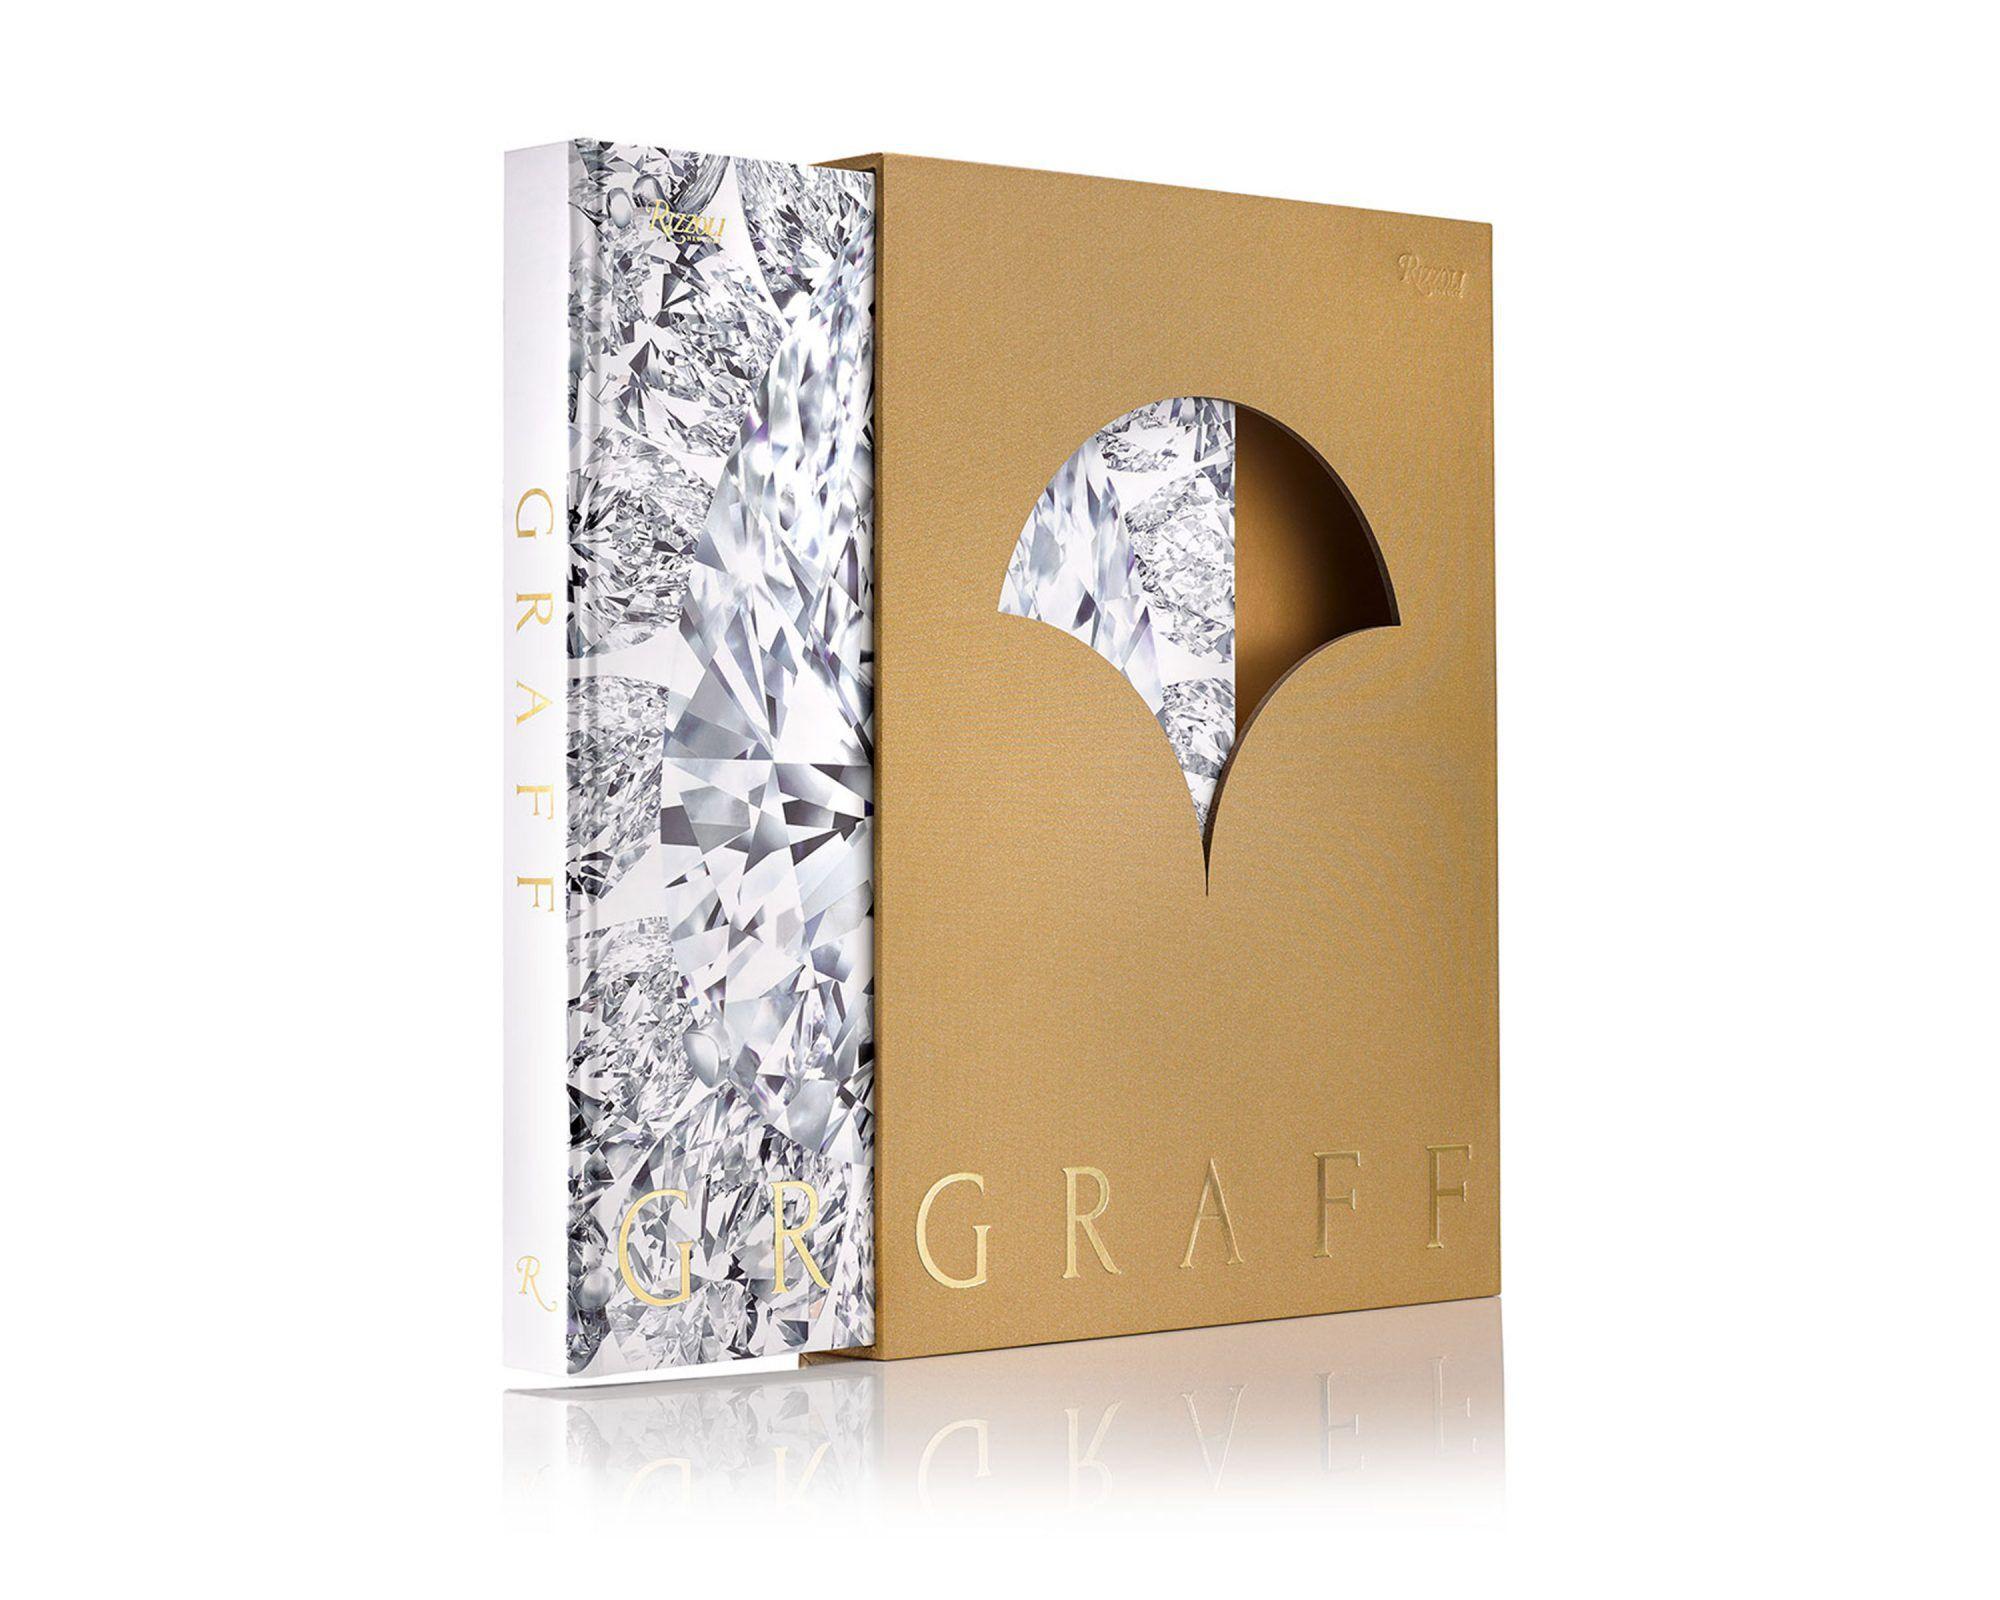 The Graff coffee table book